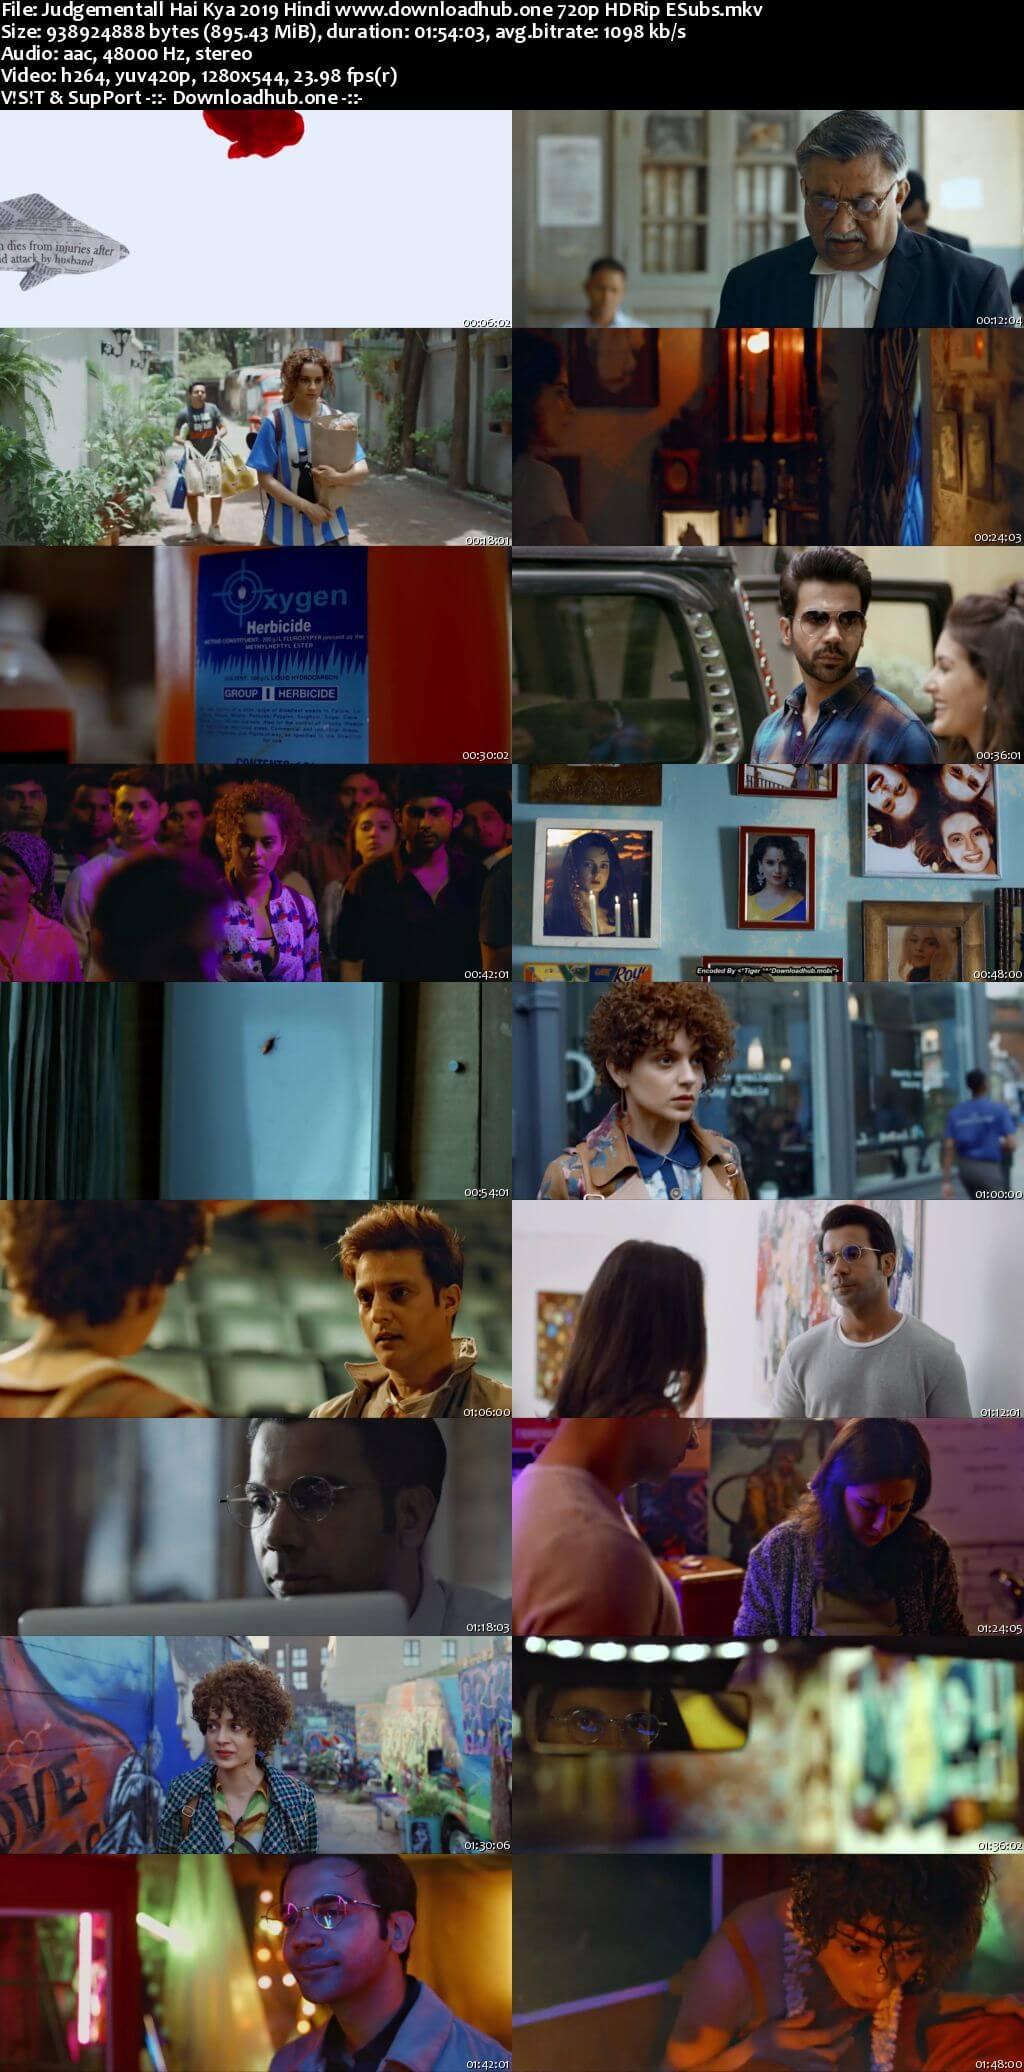 Download Judgementall Hai Kya 2019 Hindi Movie 720p HDRip ESubs